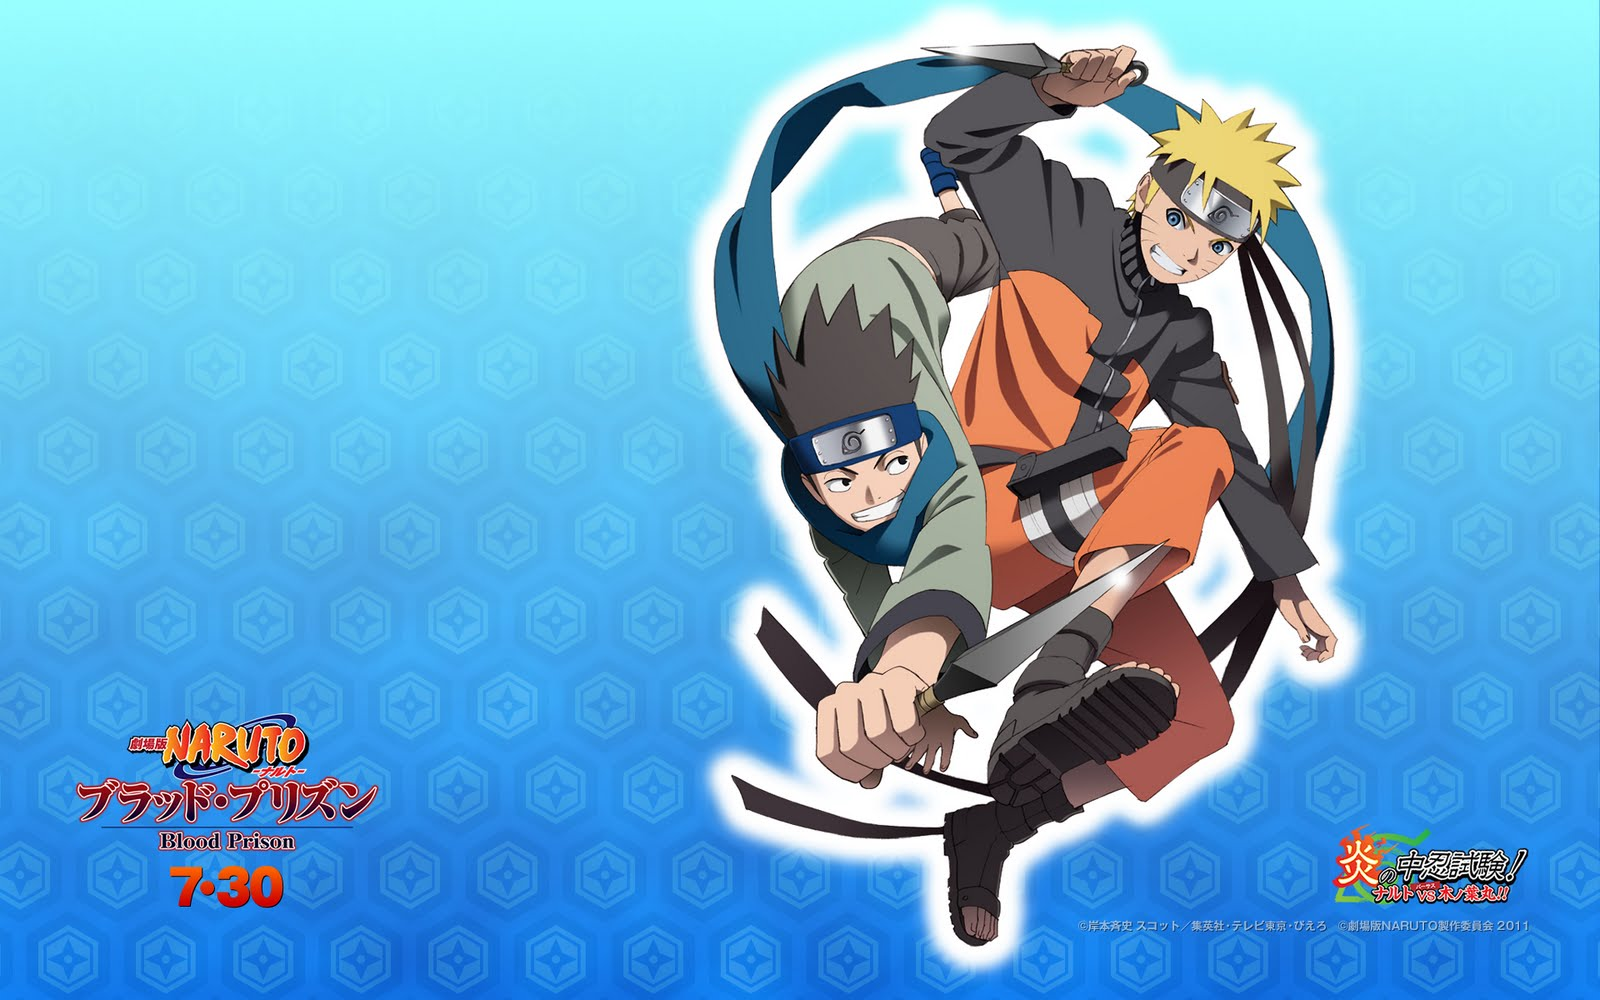 Naruto Shippuden 5 Blood Prison Themes InfoTaip 1600x1000